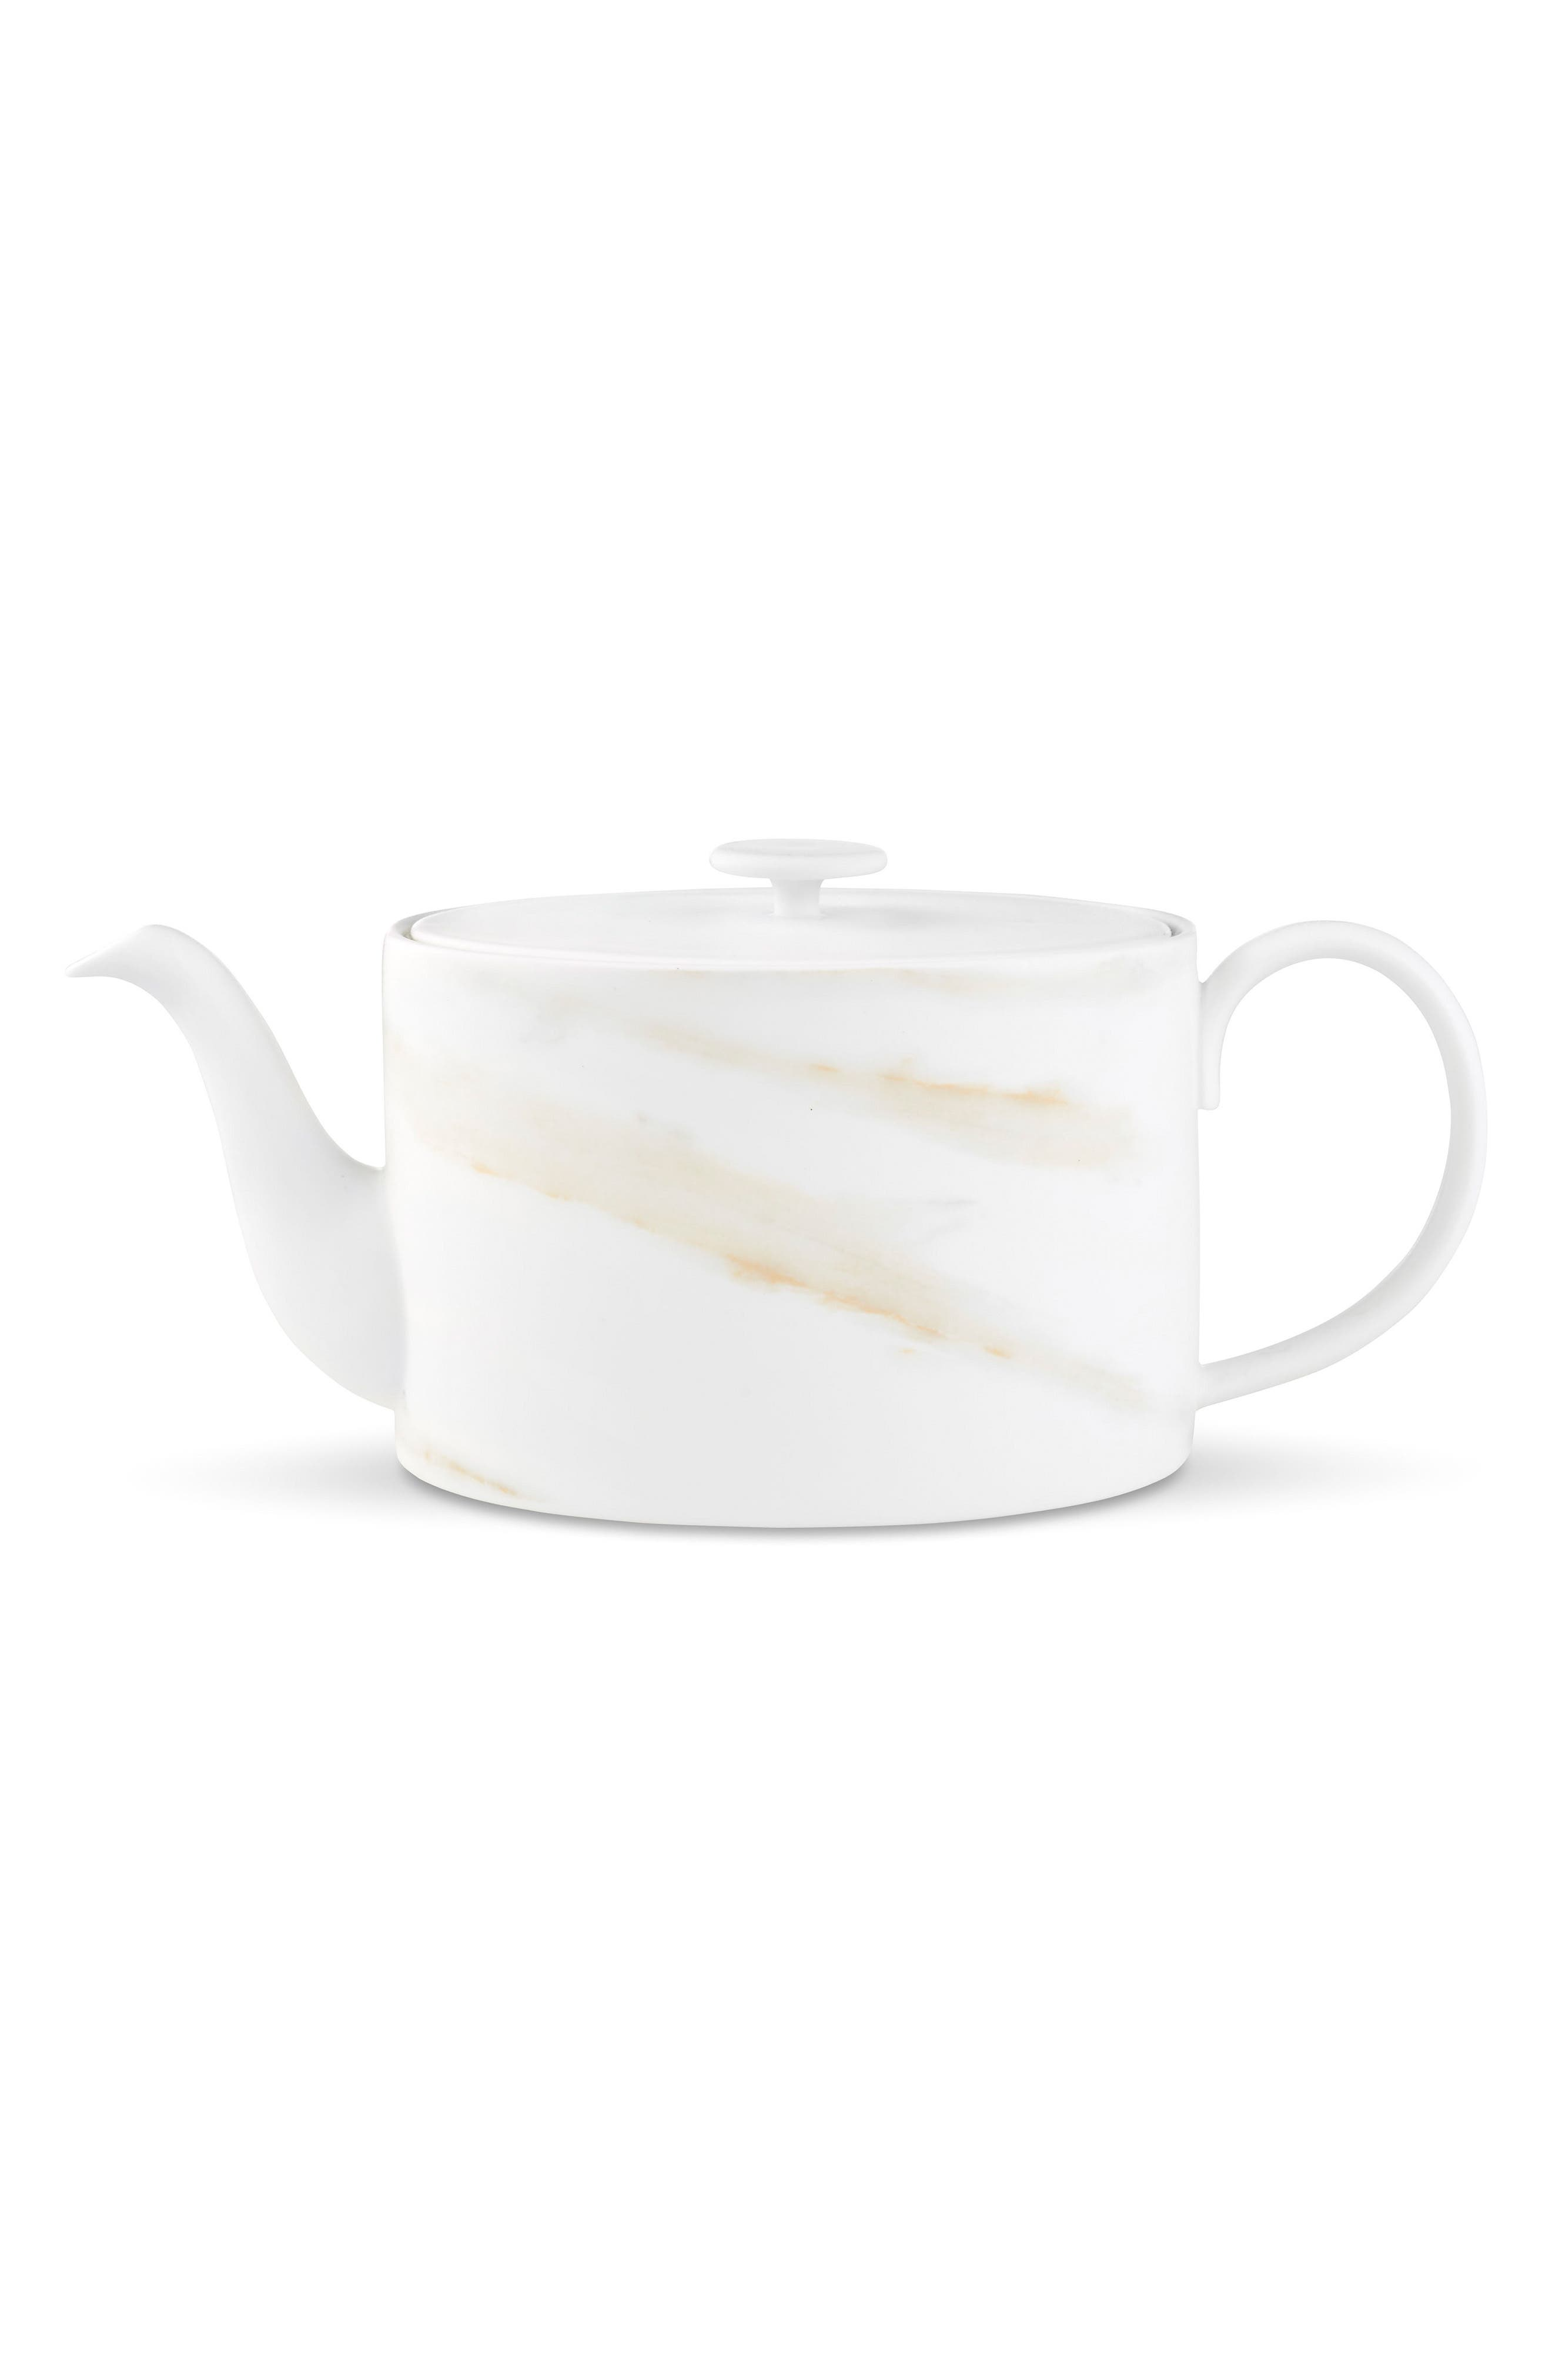 x Wedgwood Venato Imperial Teapot,                         Main,                         color,